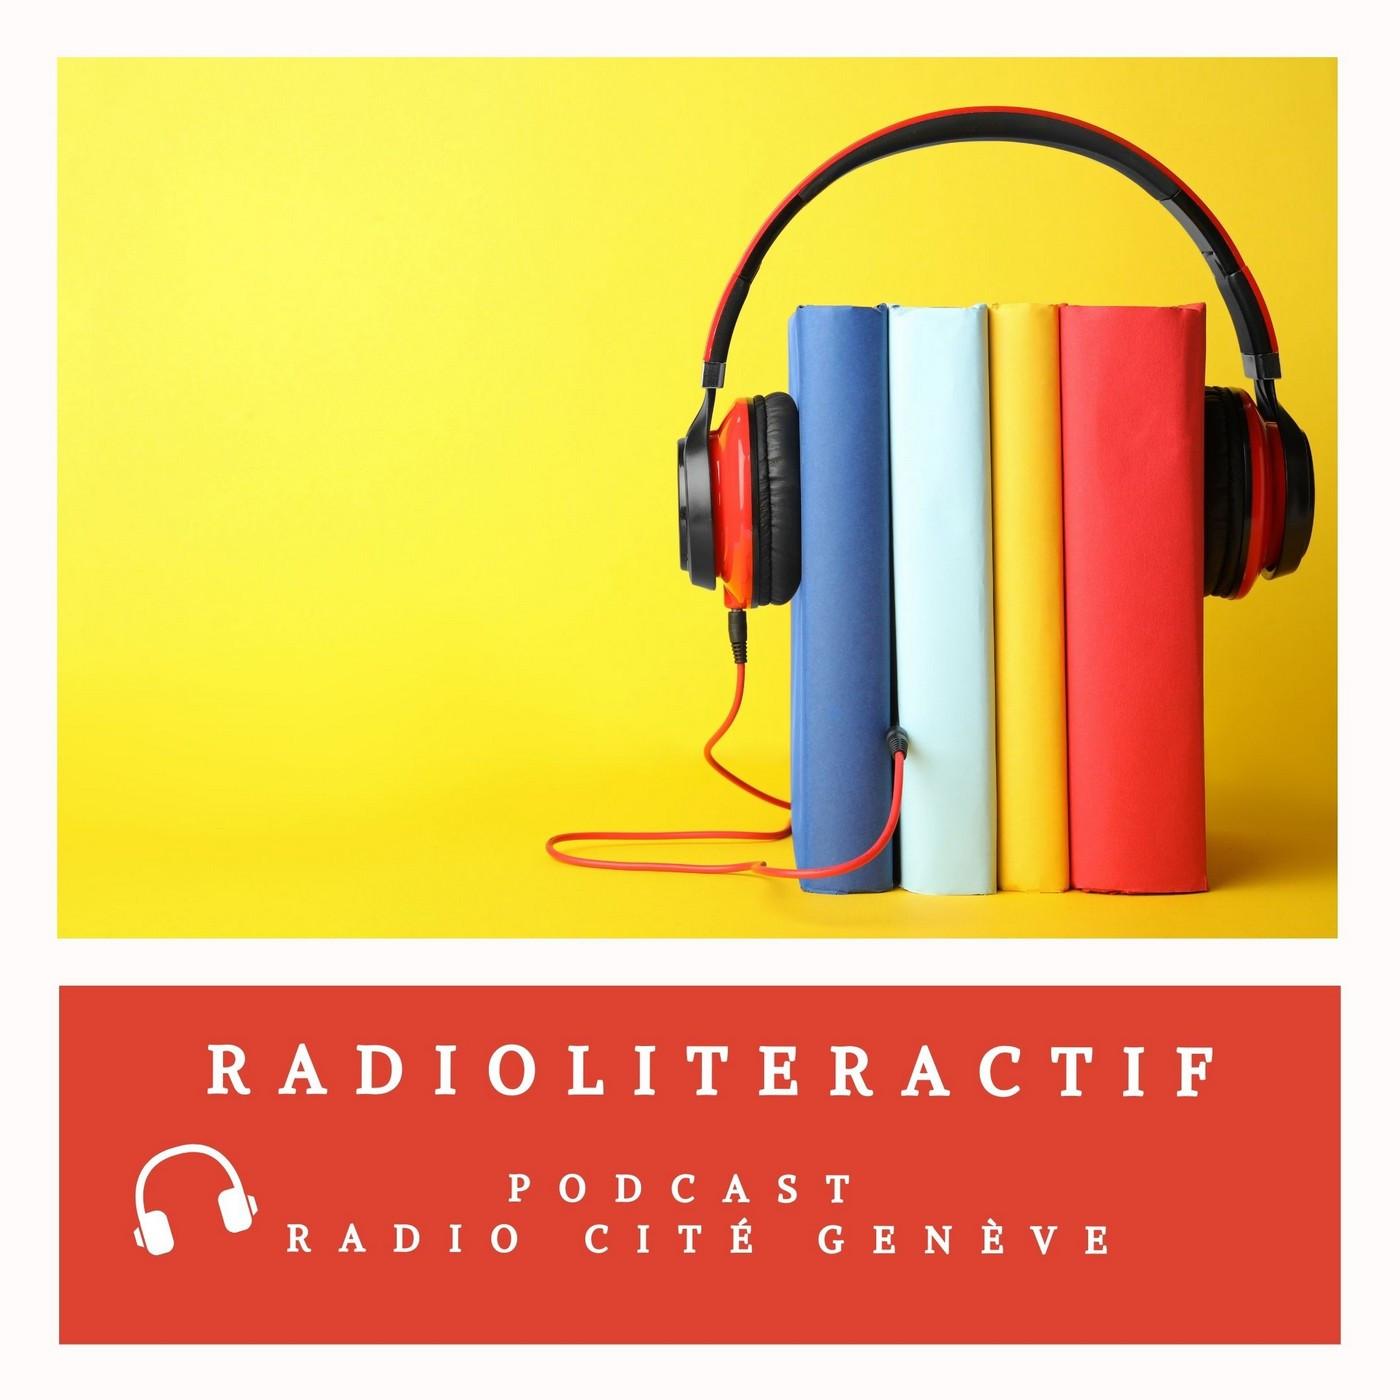 Radioliteractif du 09/11/20 - Reto Frei